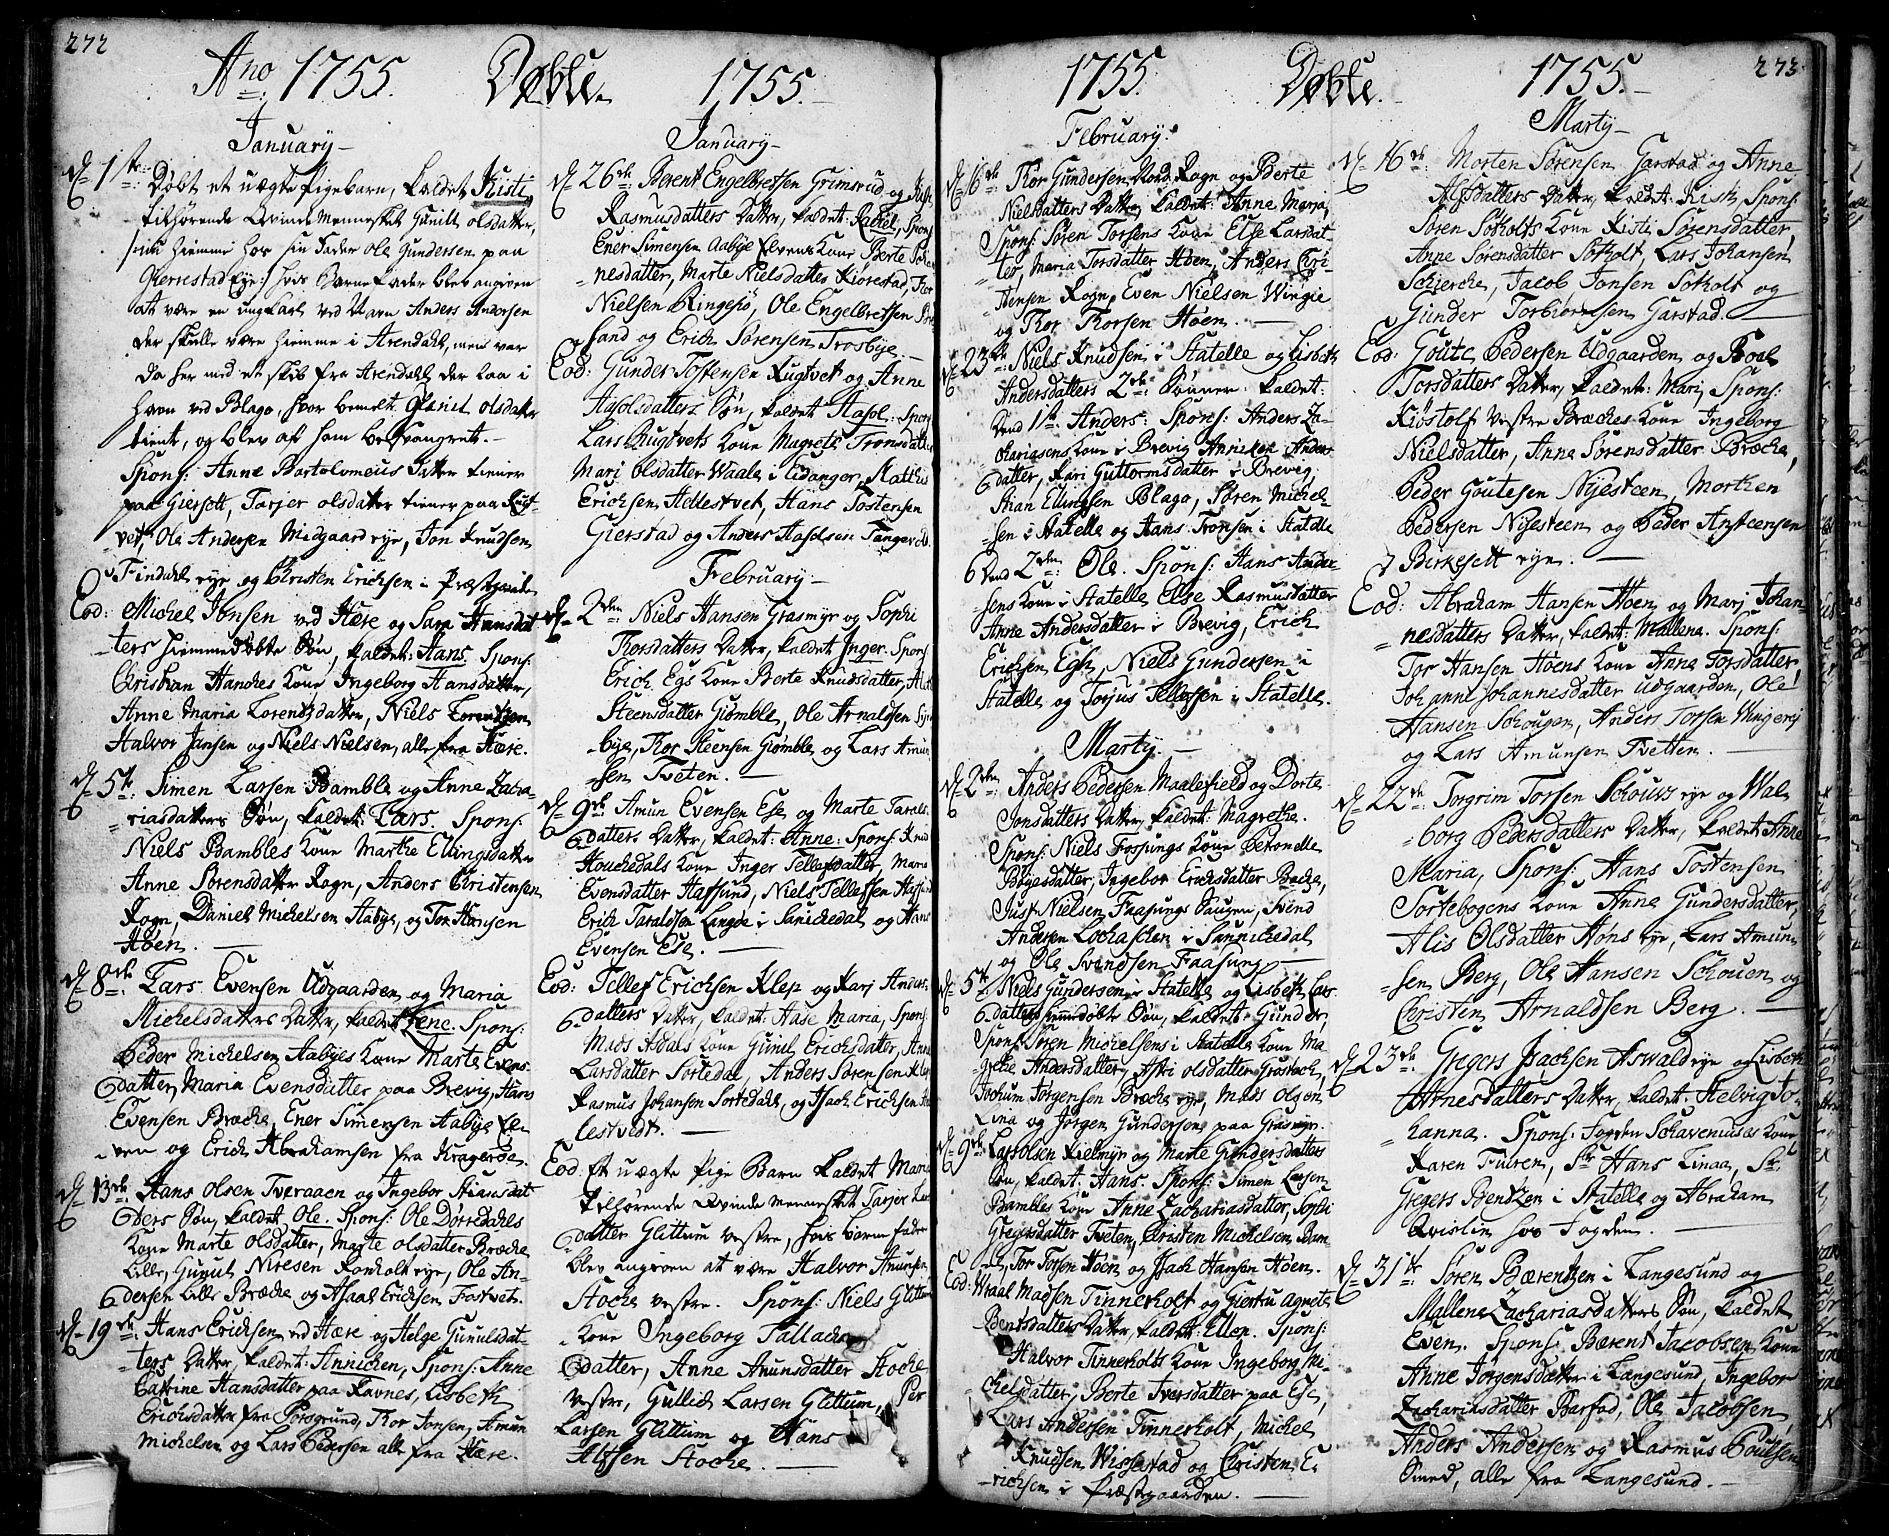 SAKO, Bamble kirkebøker, F/Fa/L0001: Ministerialbok nr. I 1, 1702-1774, s. 272-273